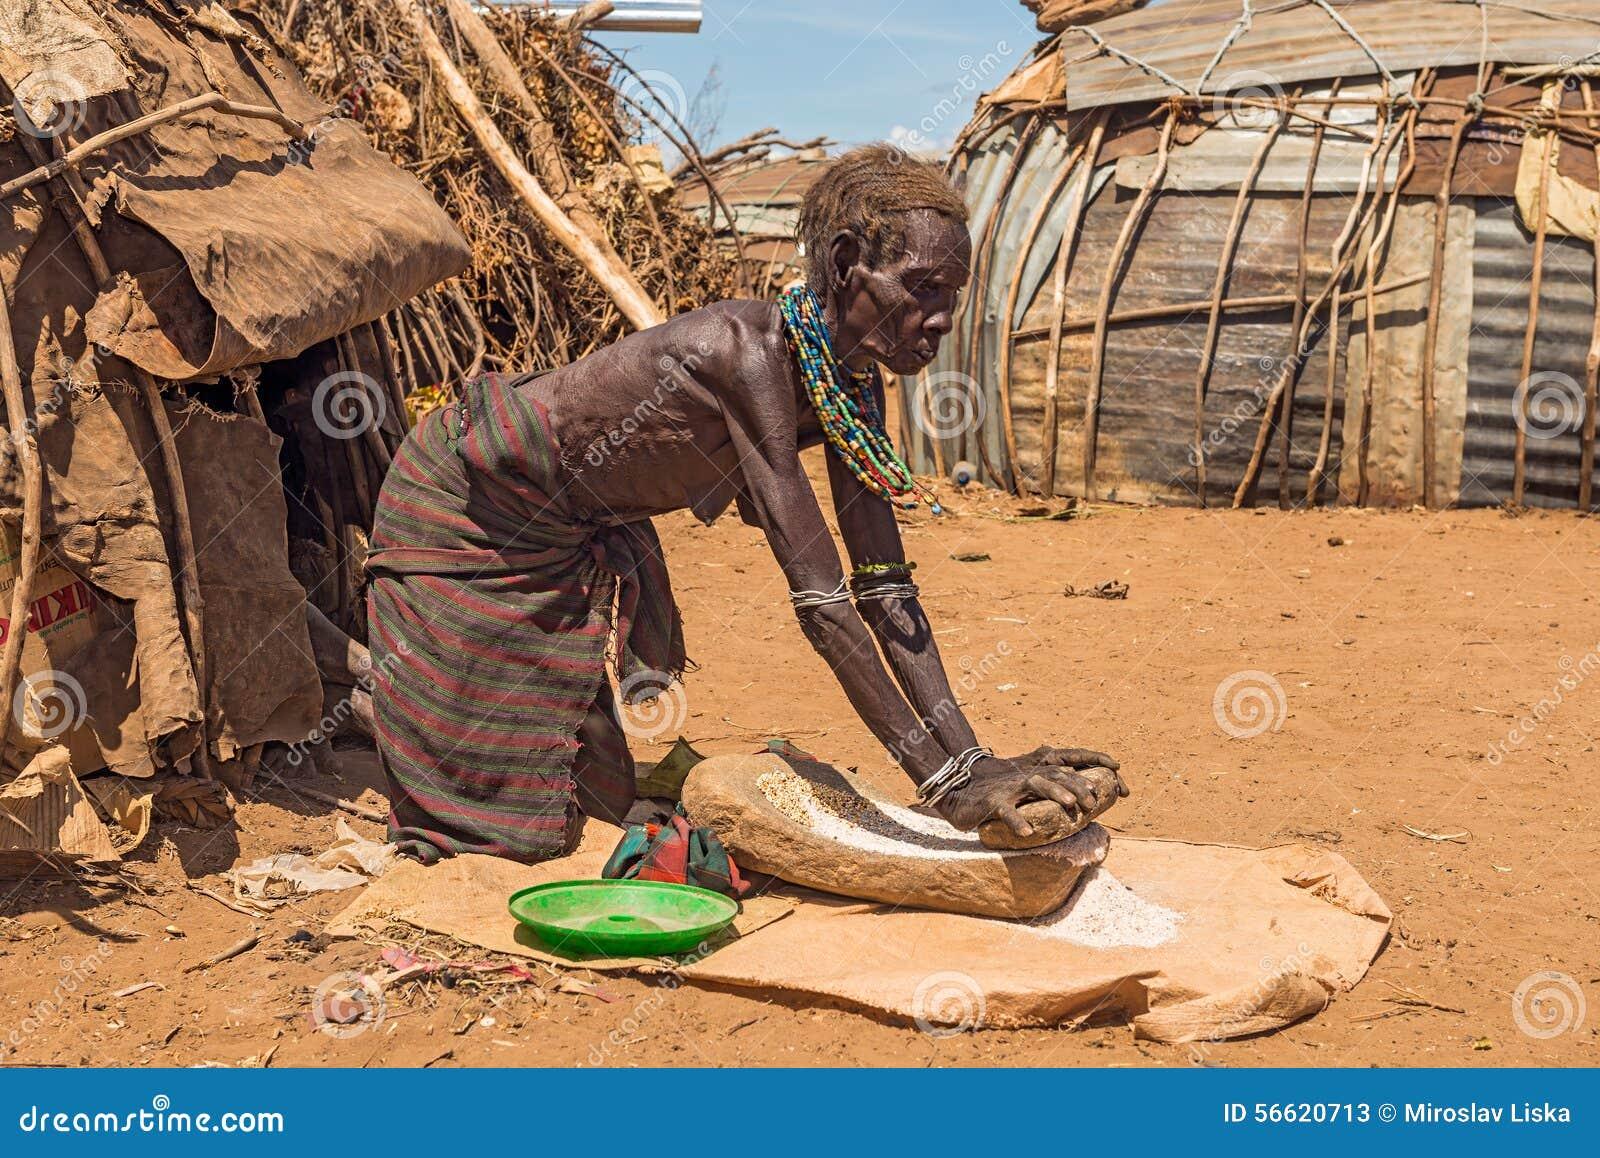 dame-ge-de-la-tribu-africaine-dasanesh-fonctionnant-devant-56620713.jpg